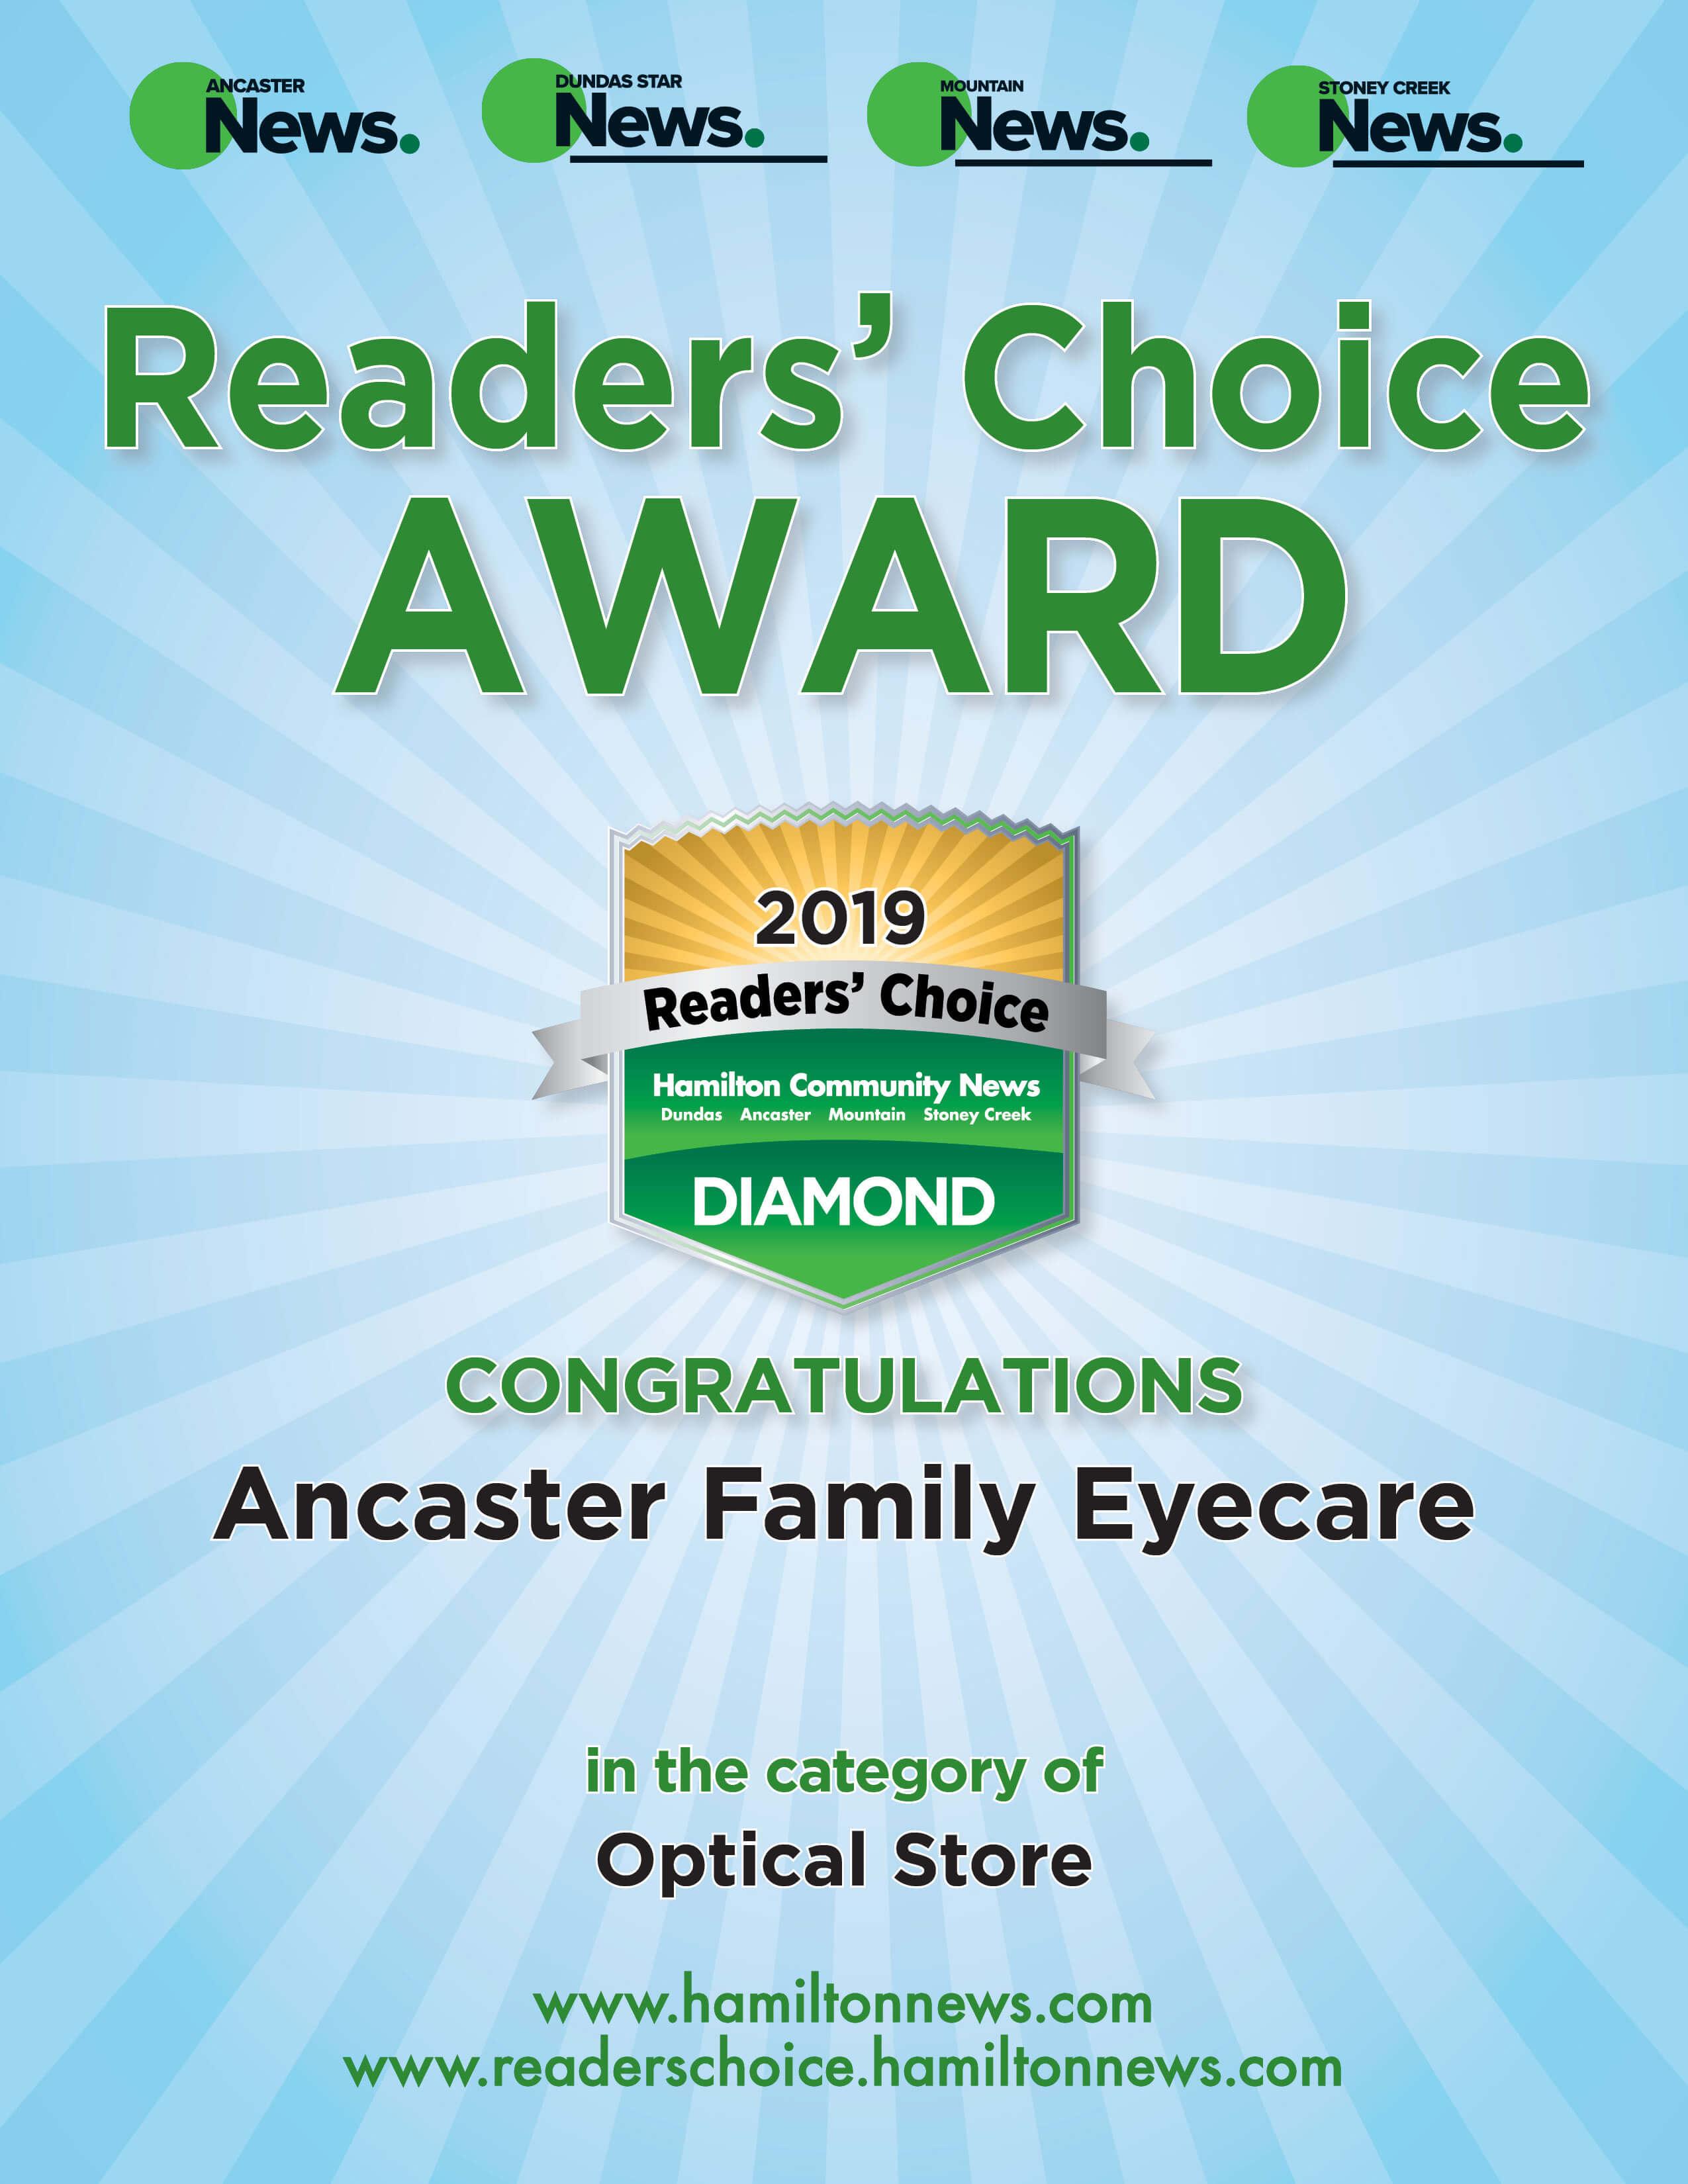 Best Optcal Award